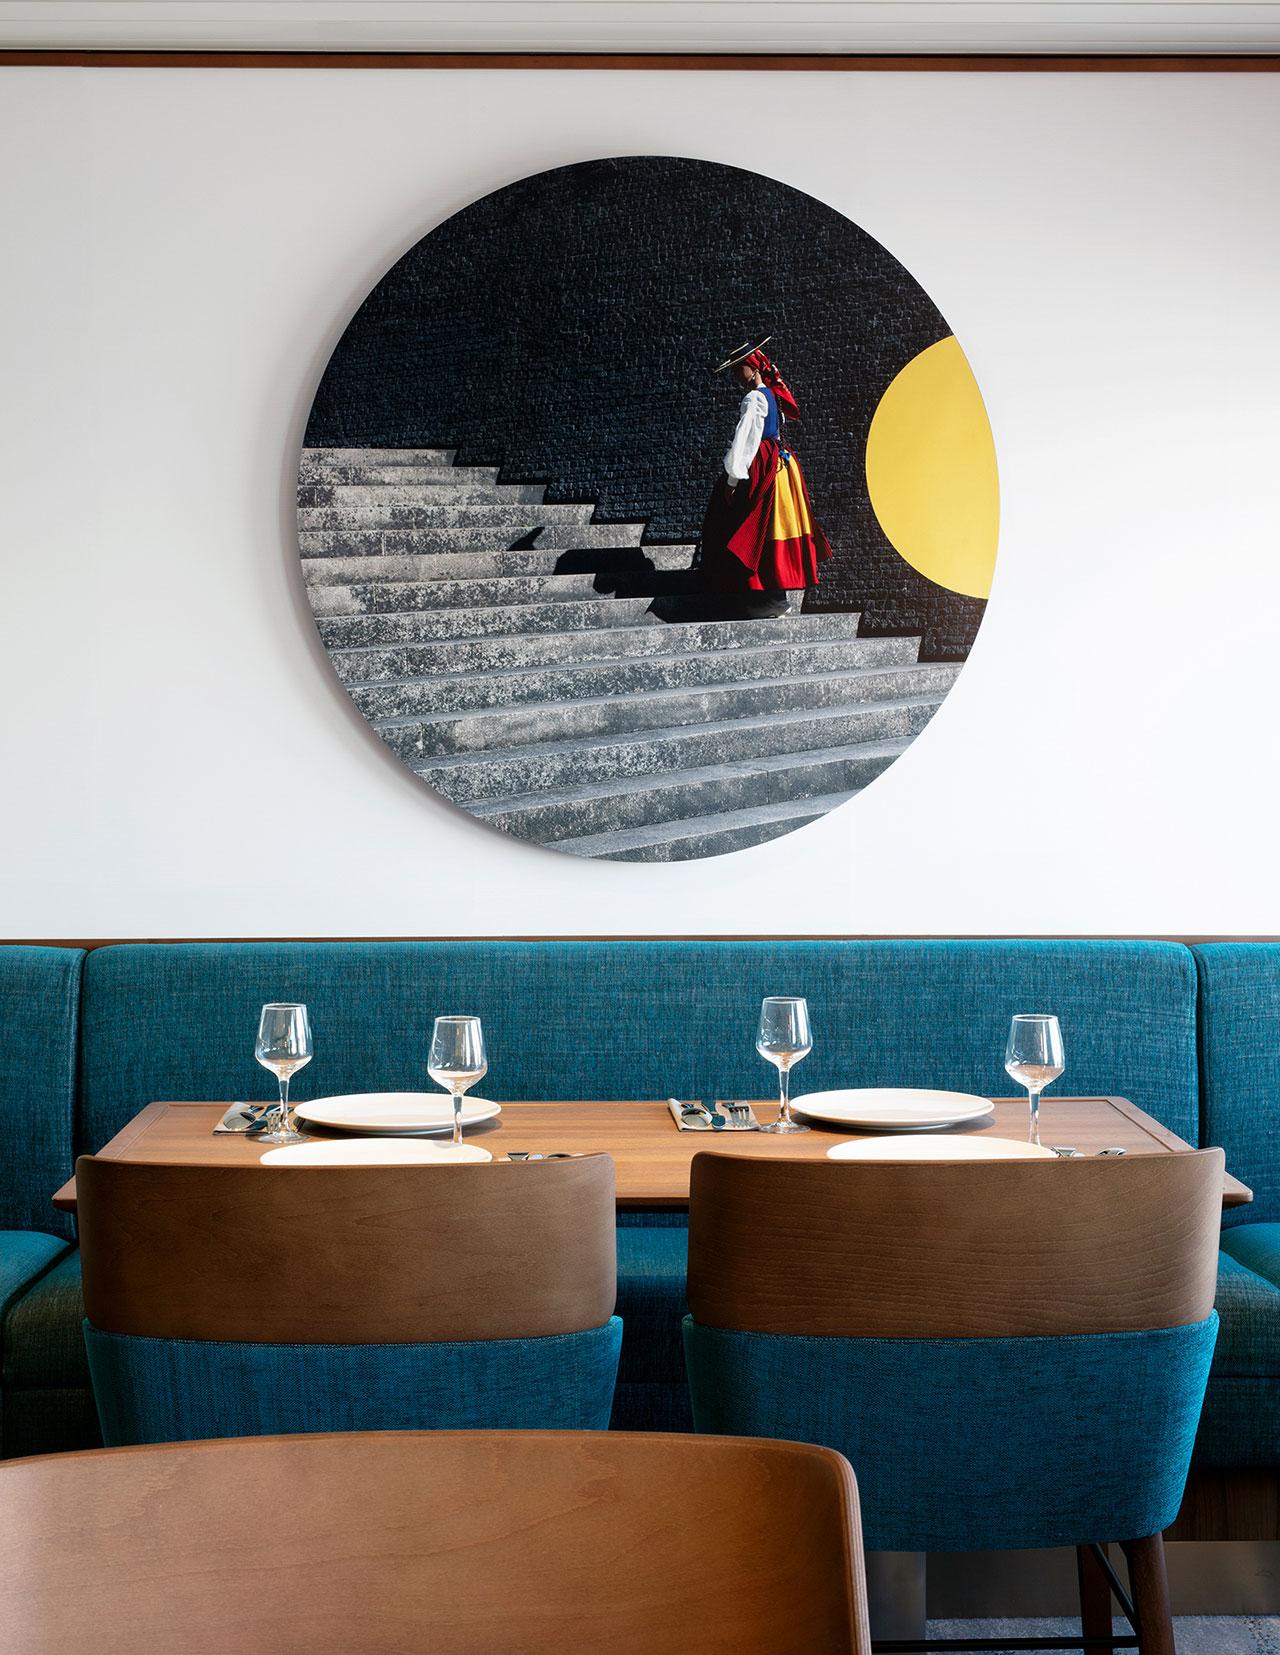 AZUL Restaurant. Art & Photography by Klunderbie.